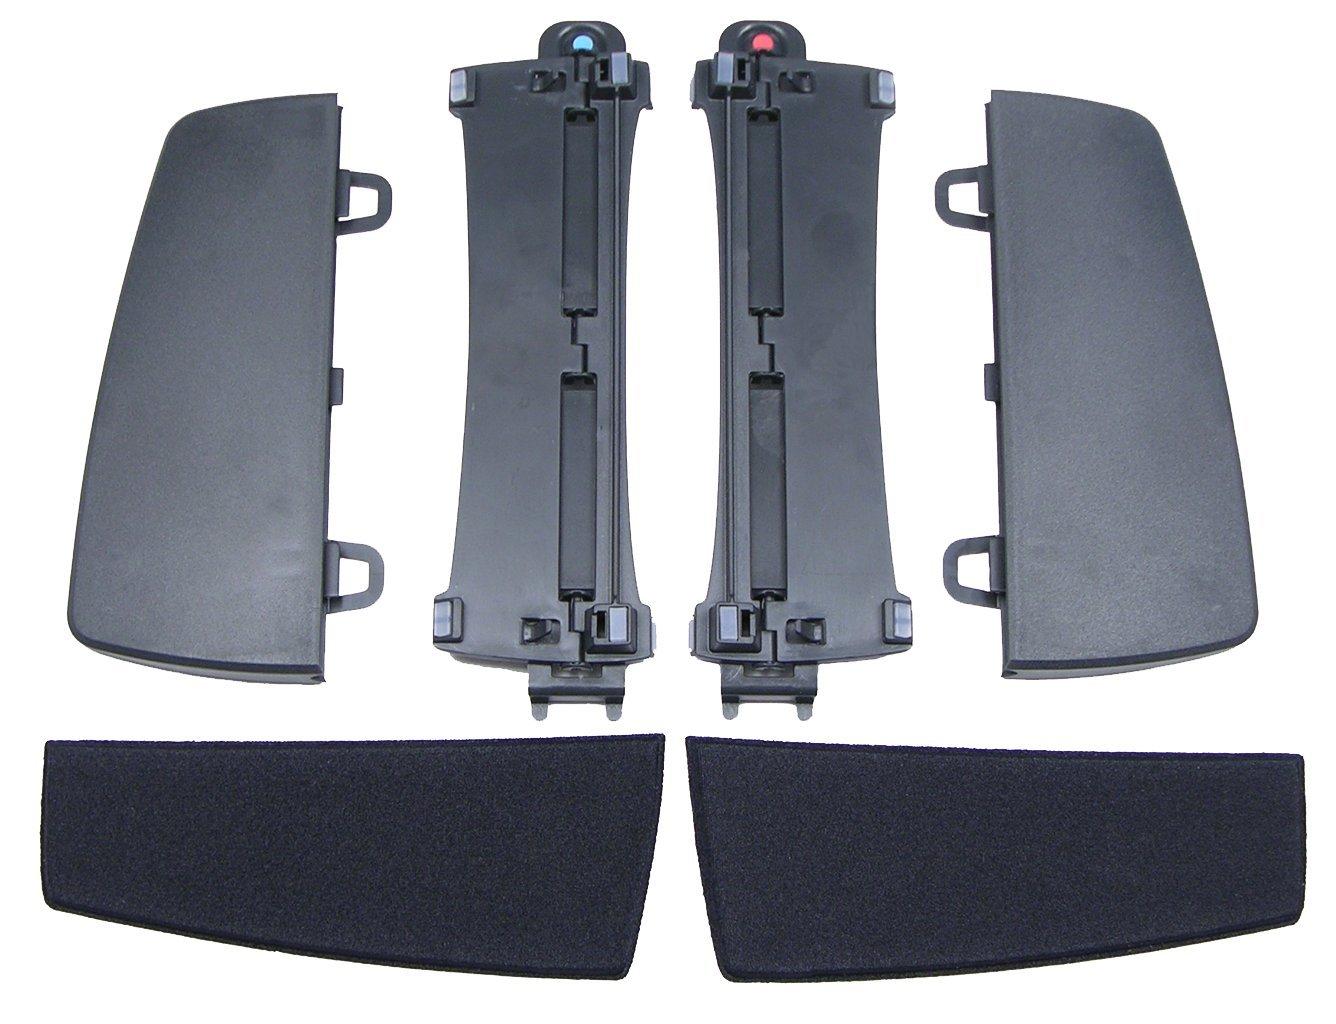 Kinesis Freestyle 2 Ergonomic - Soporte para teclado ergonómico (Ajuste de inclinación), negro KIN-FS-VIP3